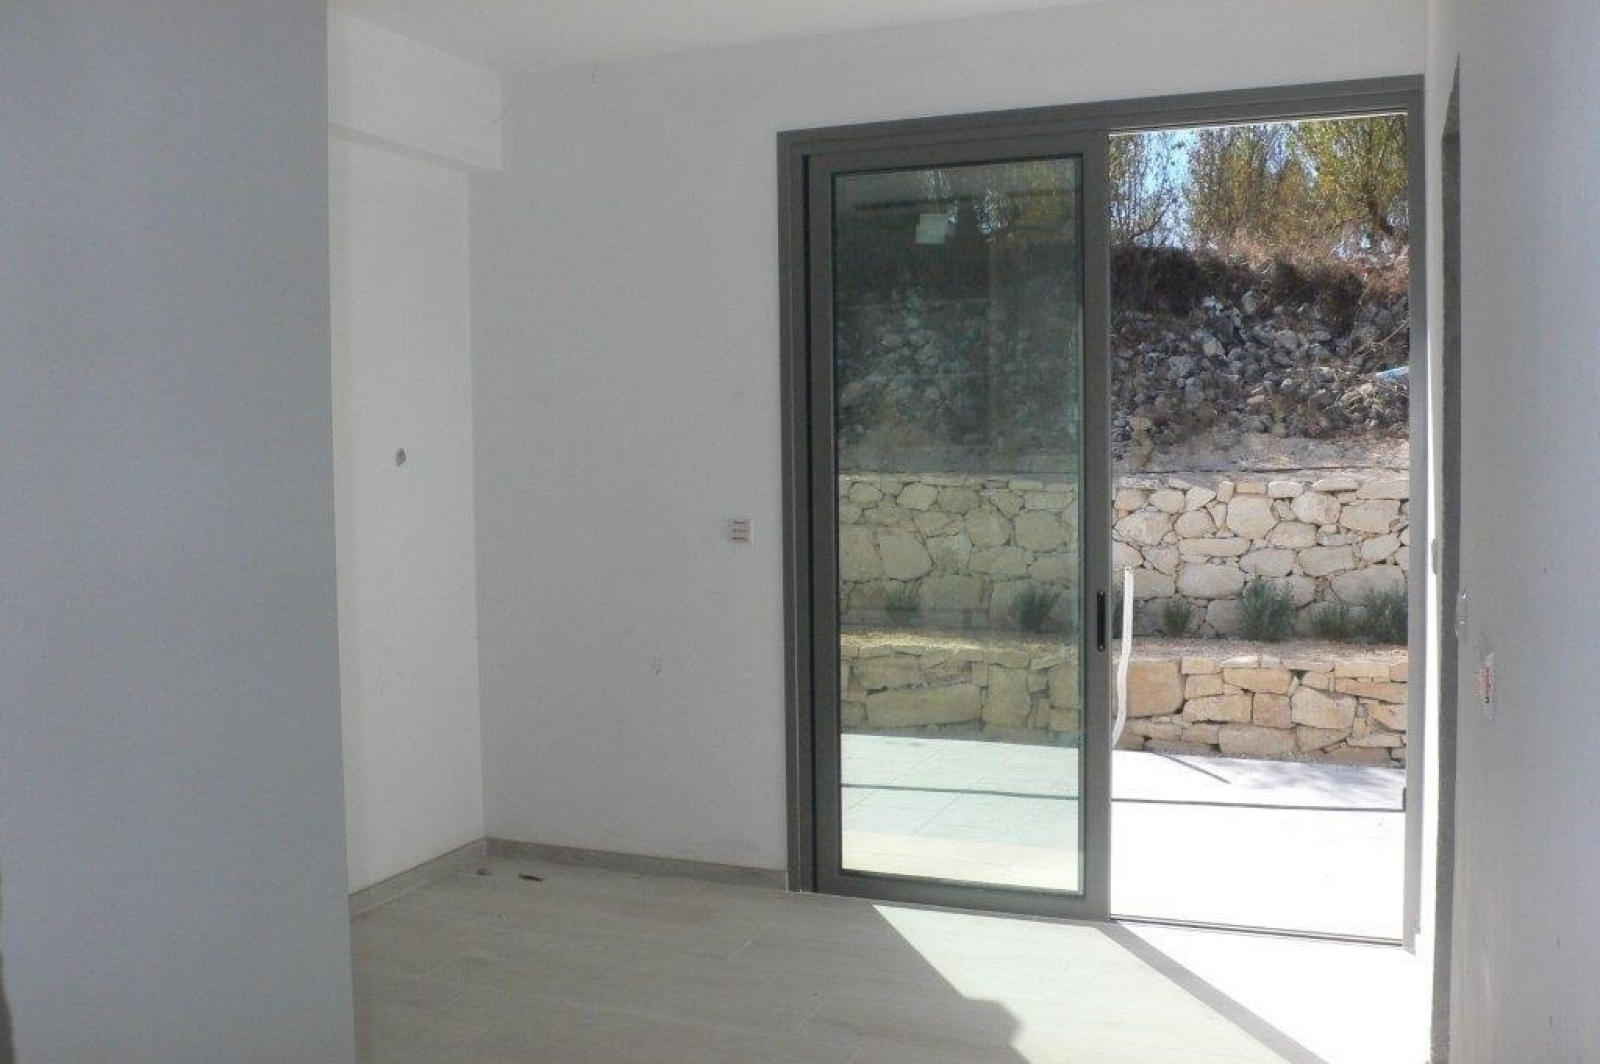 Residential Bungalow - Drouseia Height bungalow